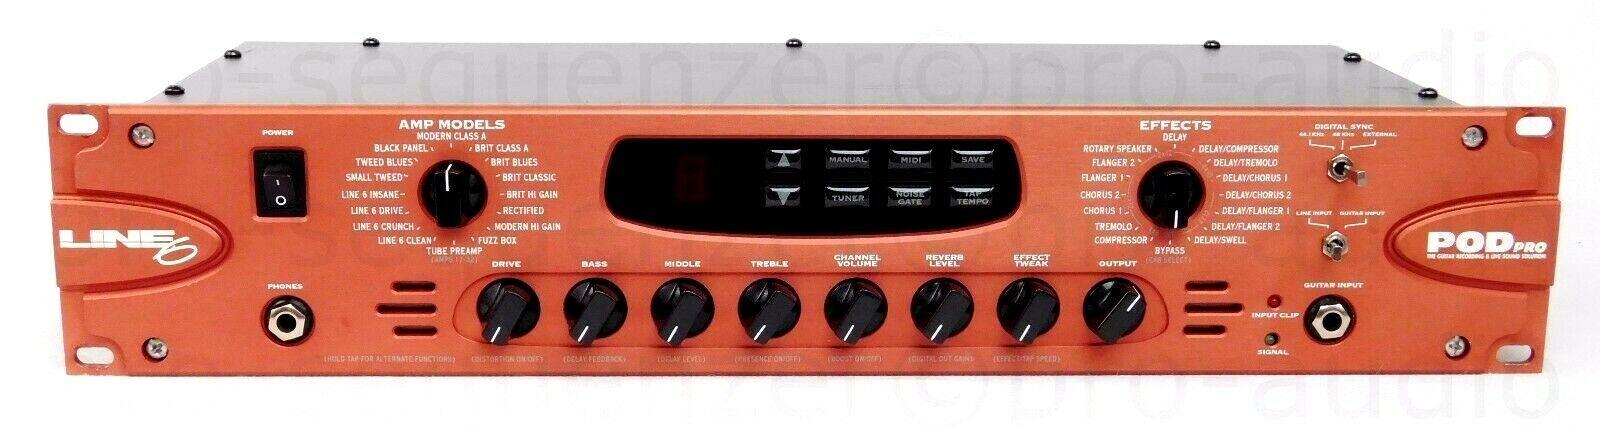 Line 6 Pod Pro Guitar Amp Modeling Processor Classics + 1.5 J Garantie